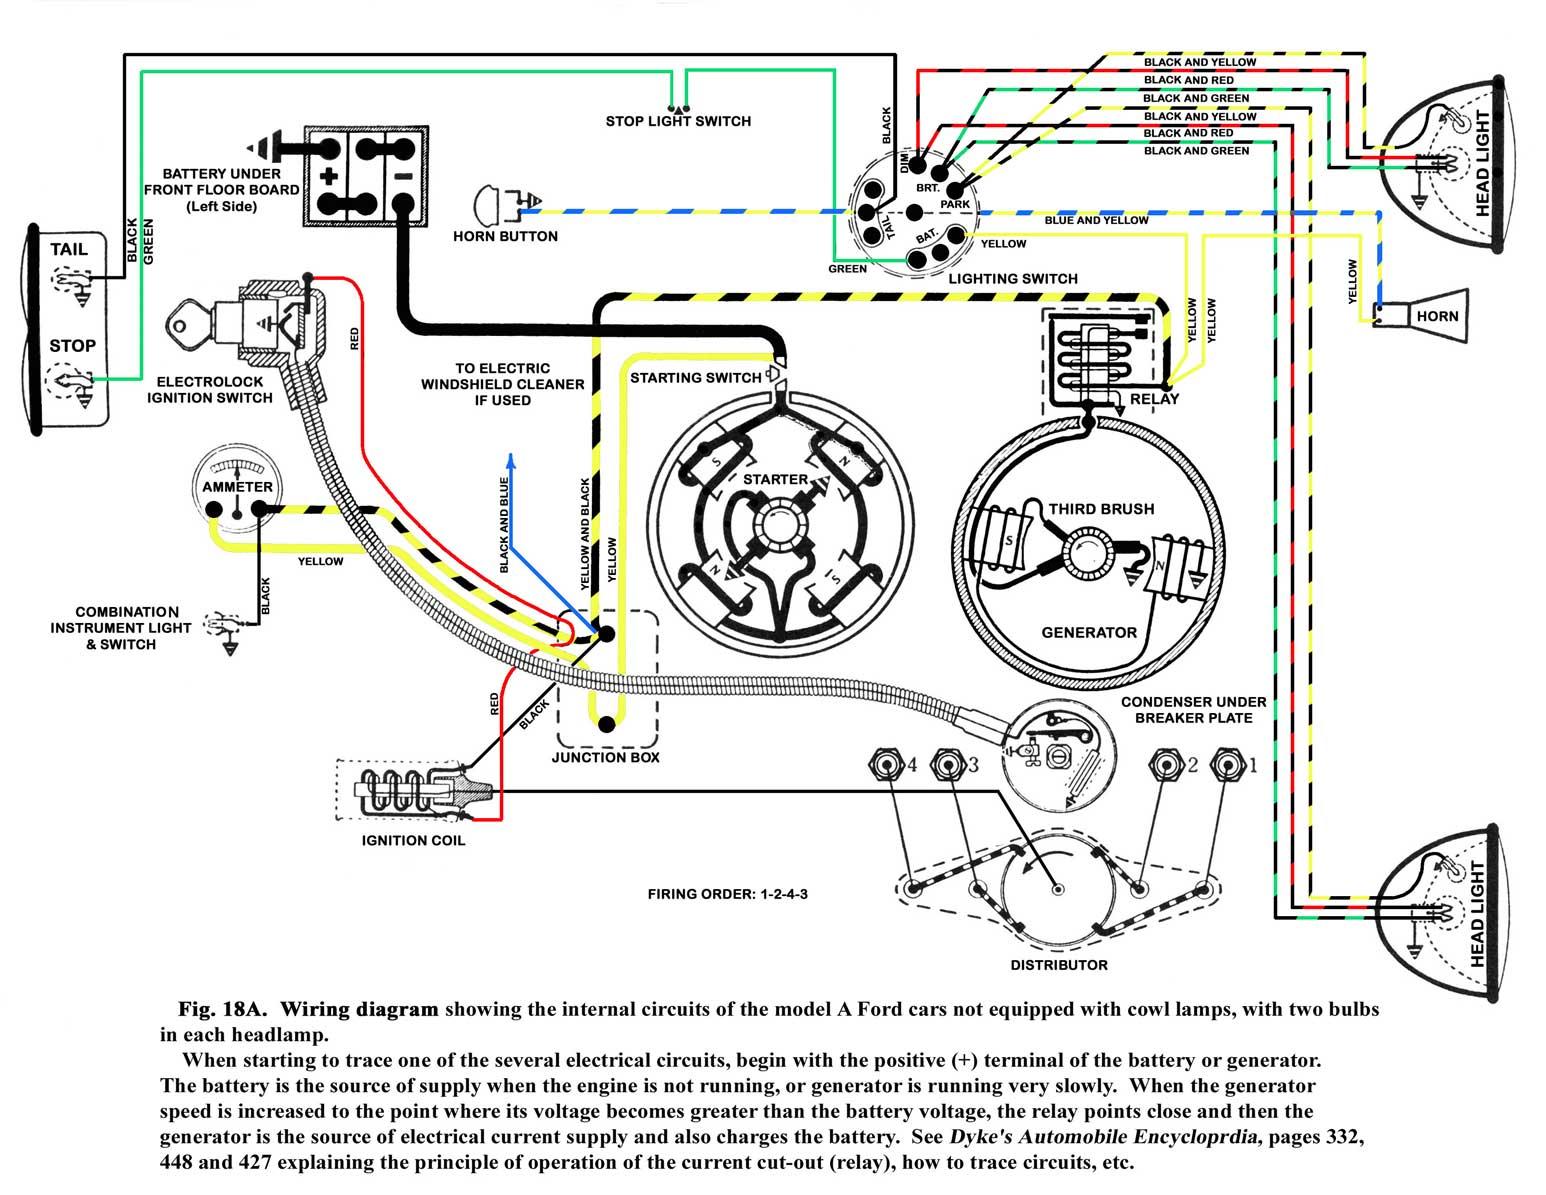 john deere 4010 wiring harness electronic schematics collections rh aaz7pngm alm63 info